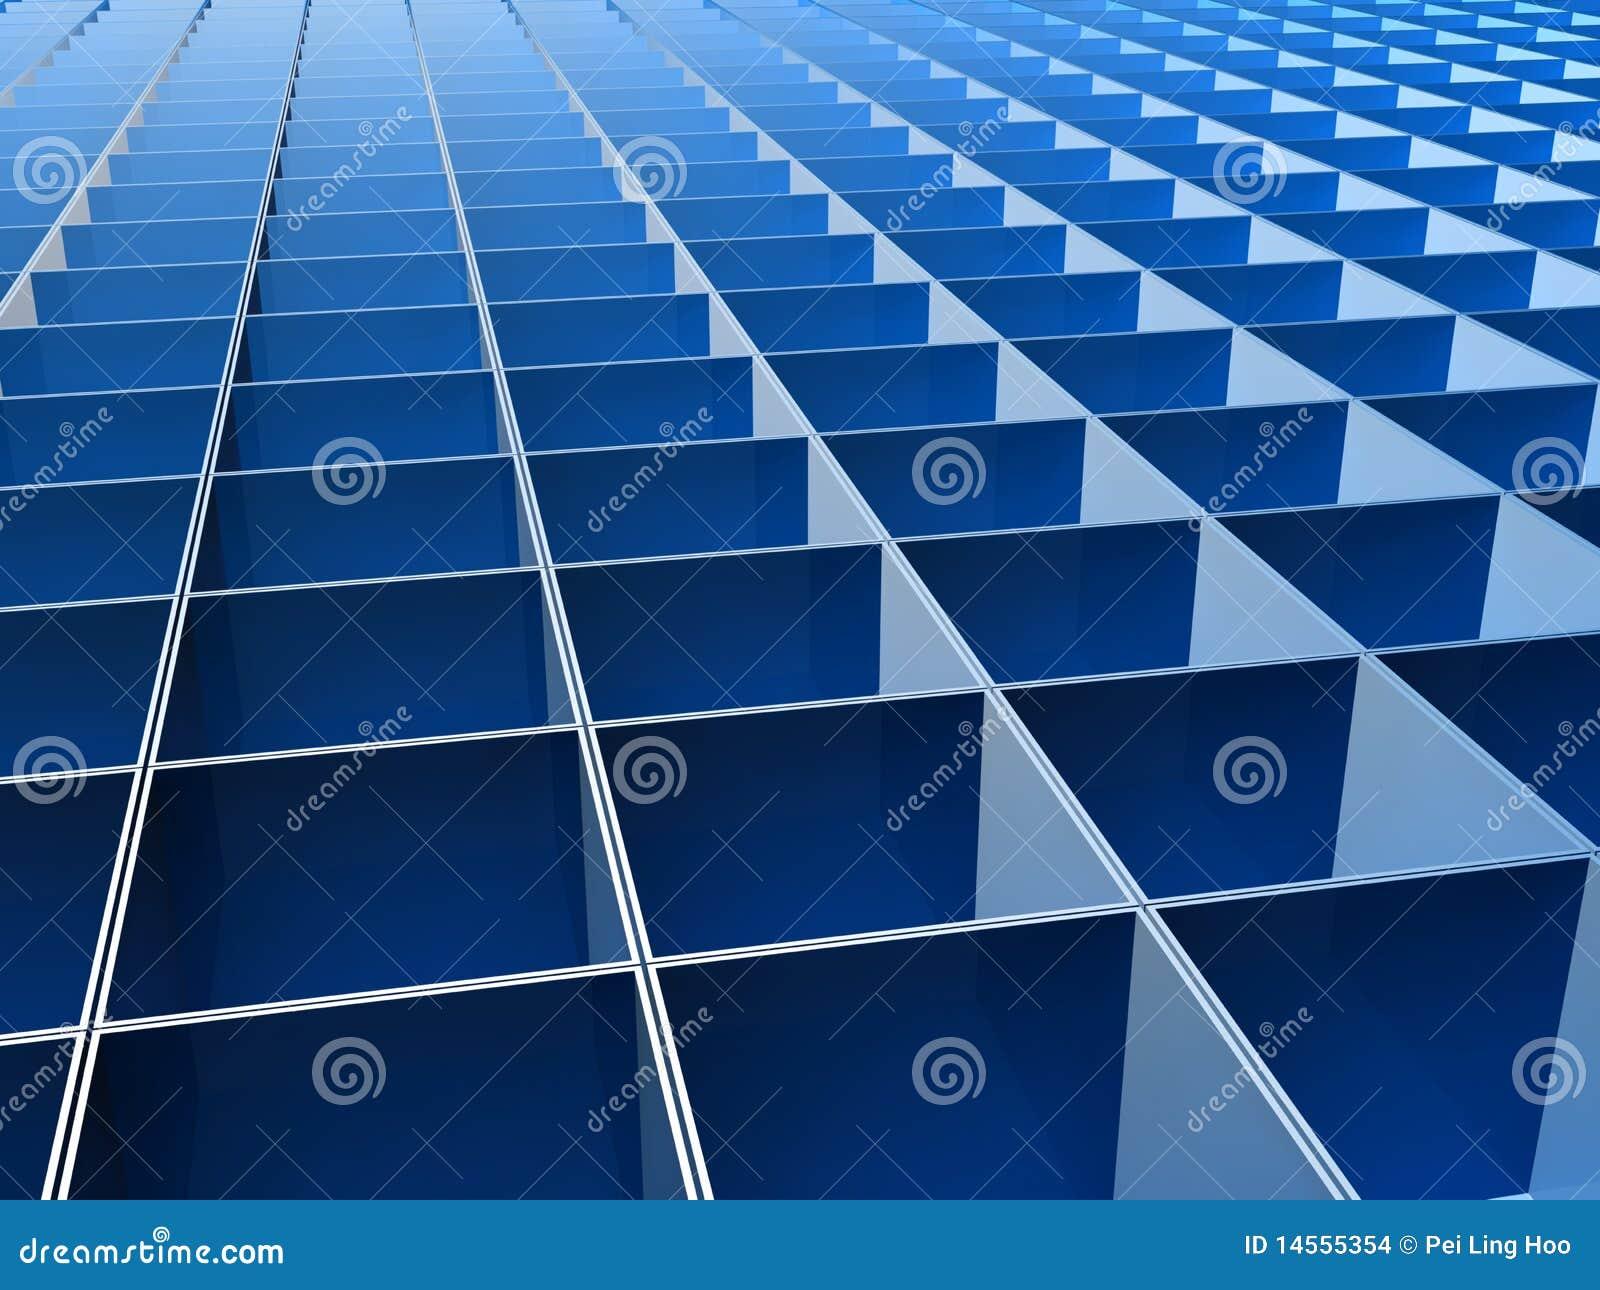 Blue square pattern background - photo#13